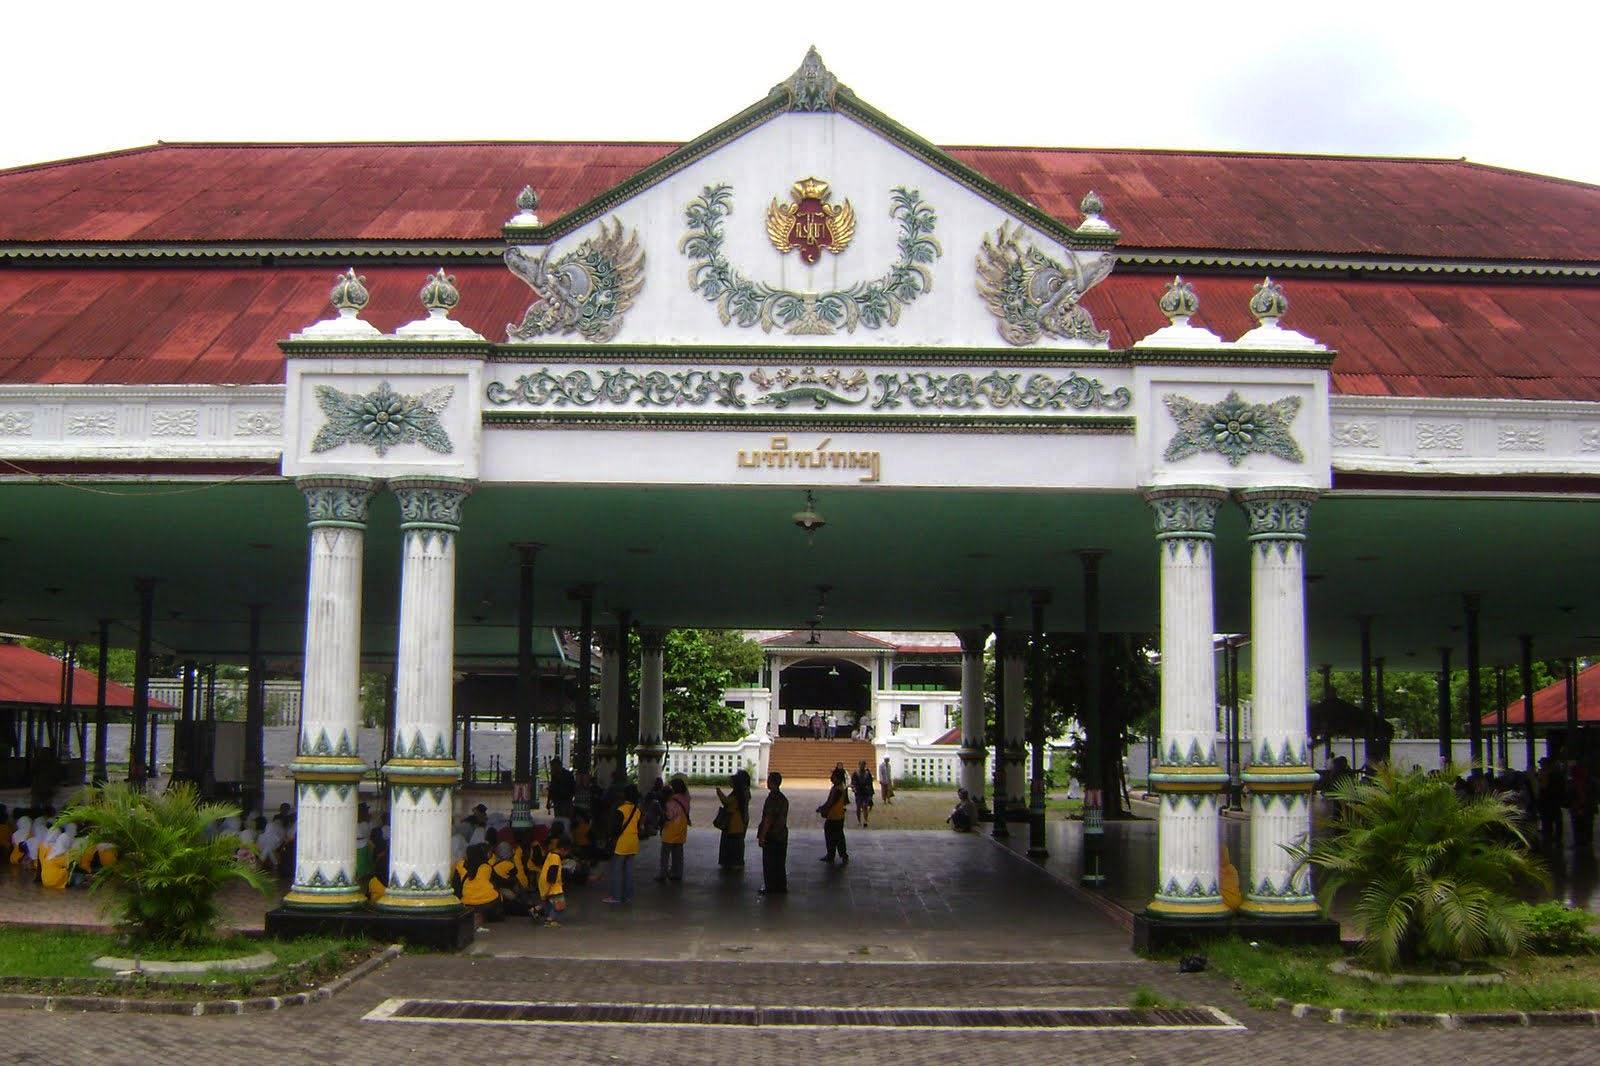 Informasi Lengkap Tengtang Keraton Yogyakarta